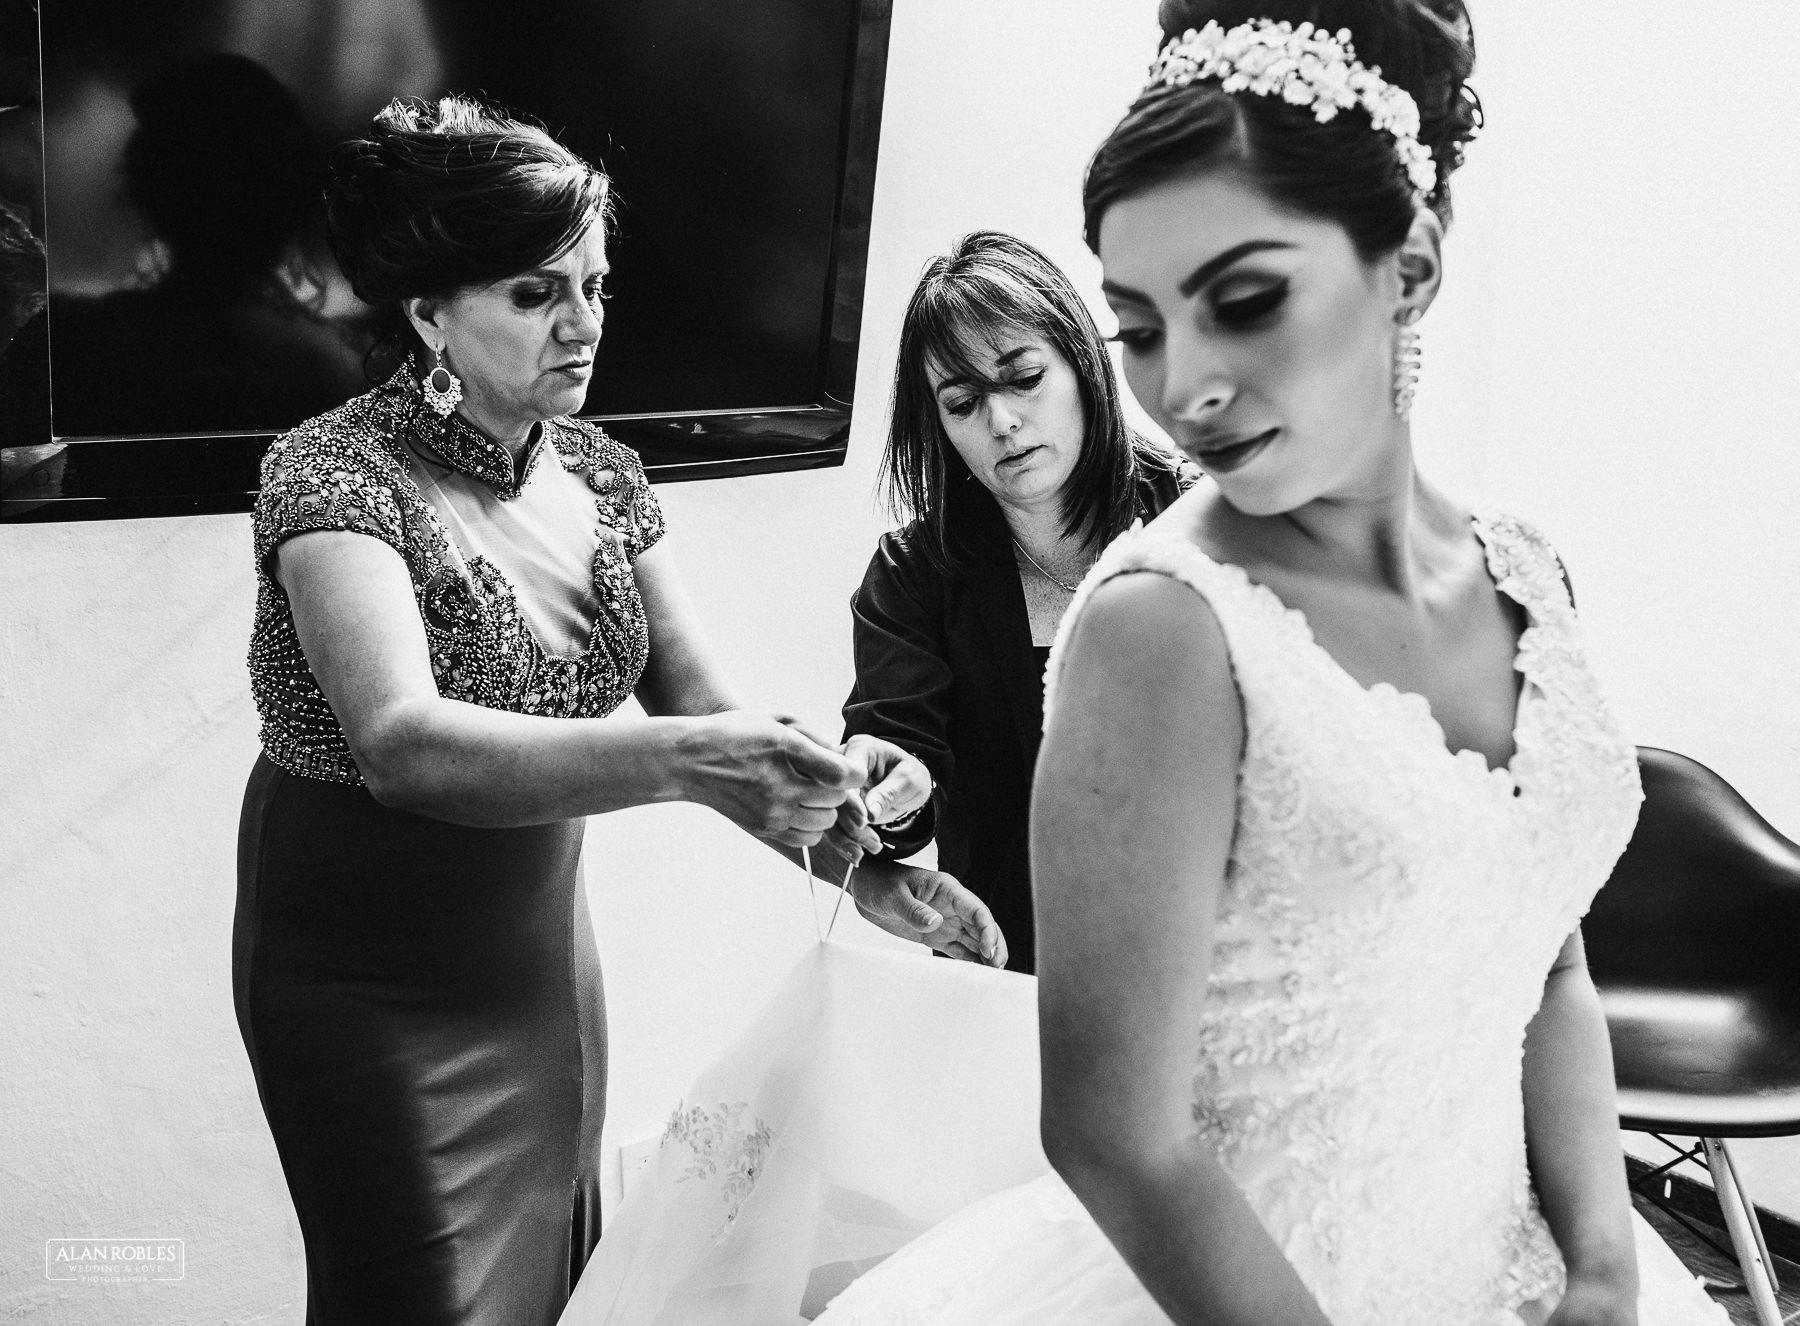 Alan Robles fotografo de bodas guadalajara - LyP Hotel Demetria-20